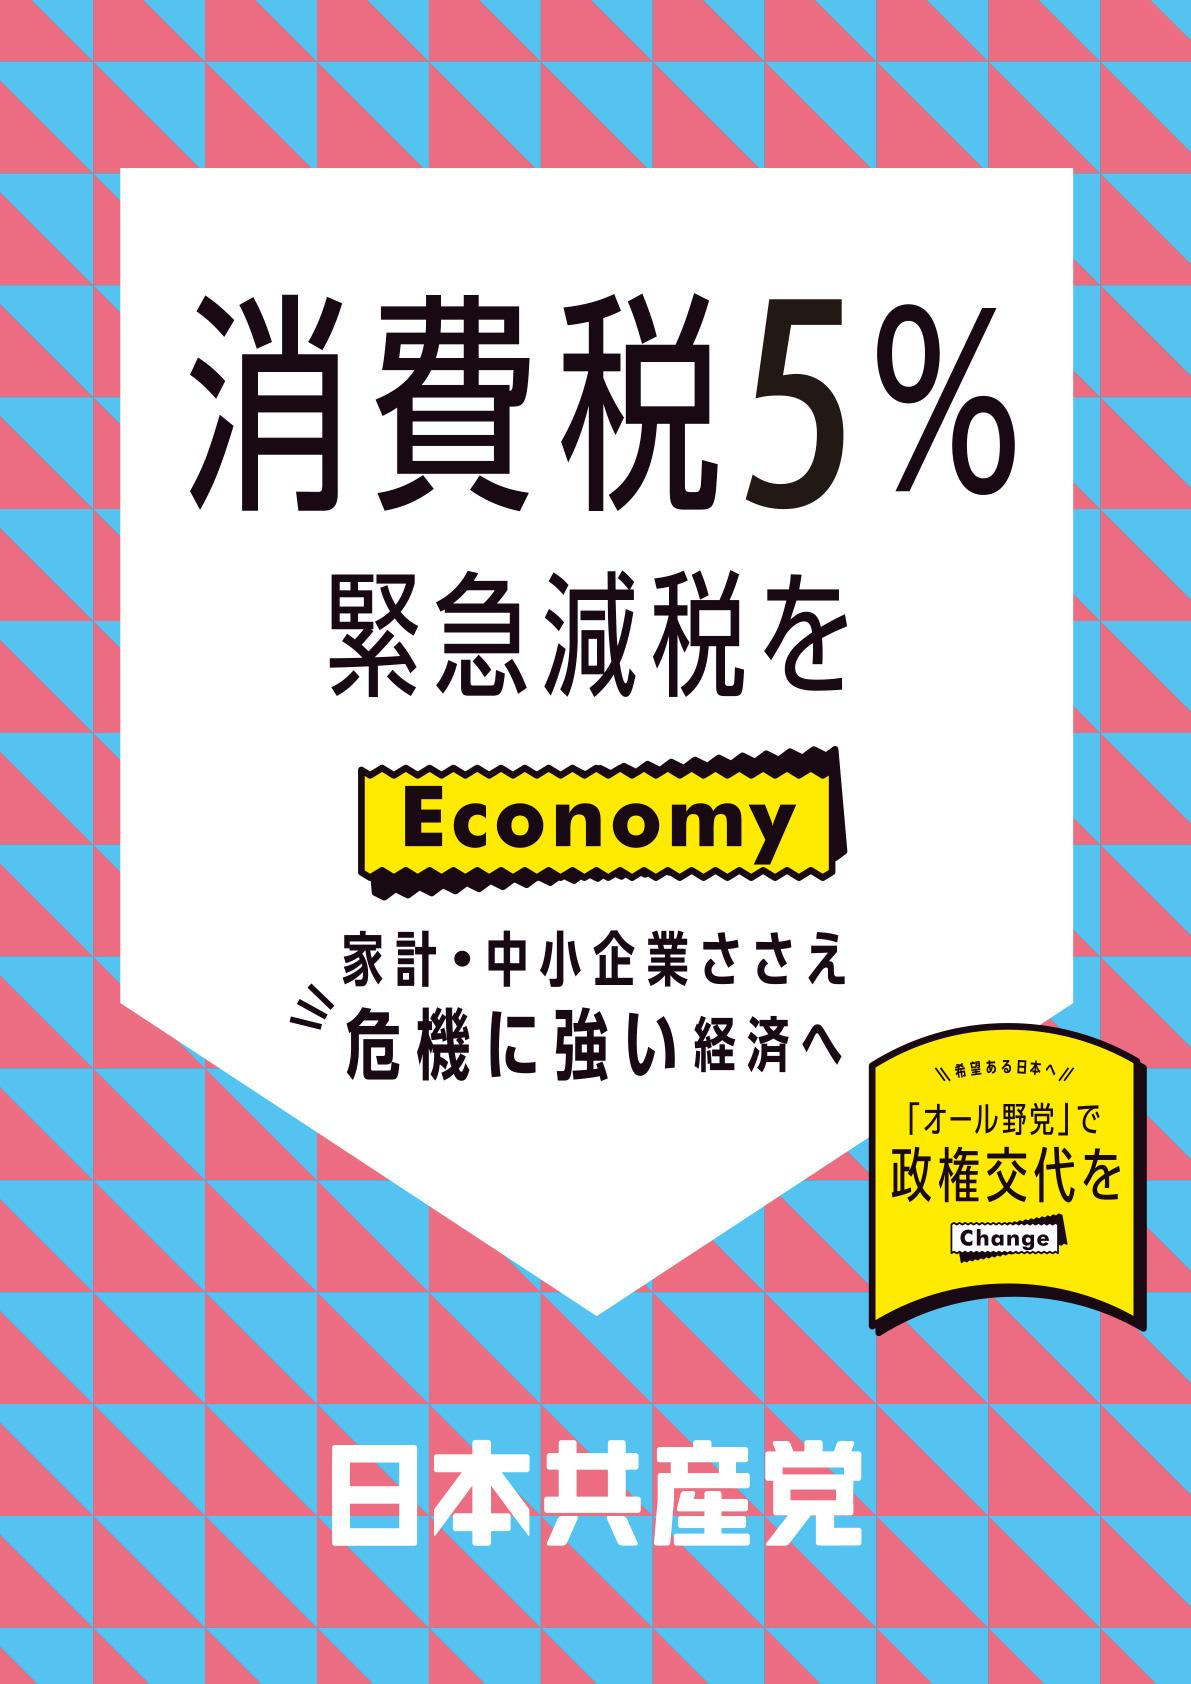 消費税5% 緊急減税を